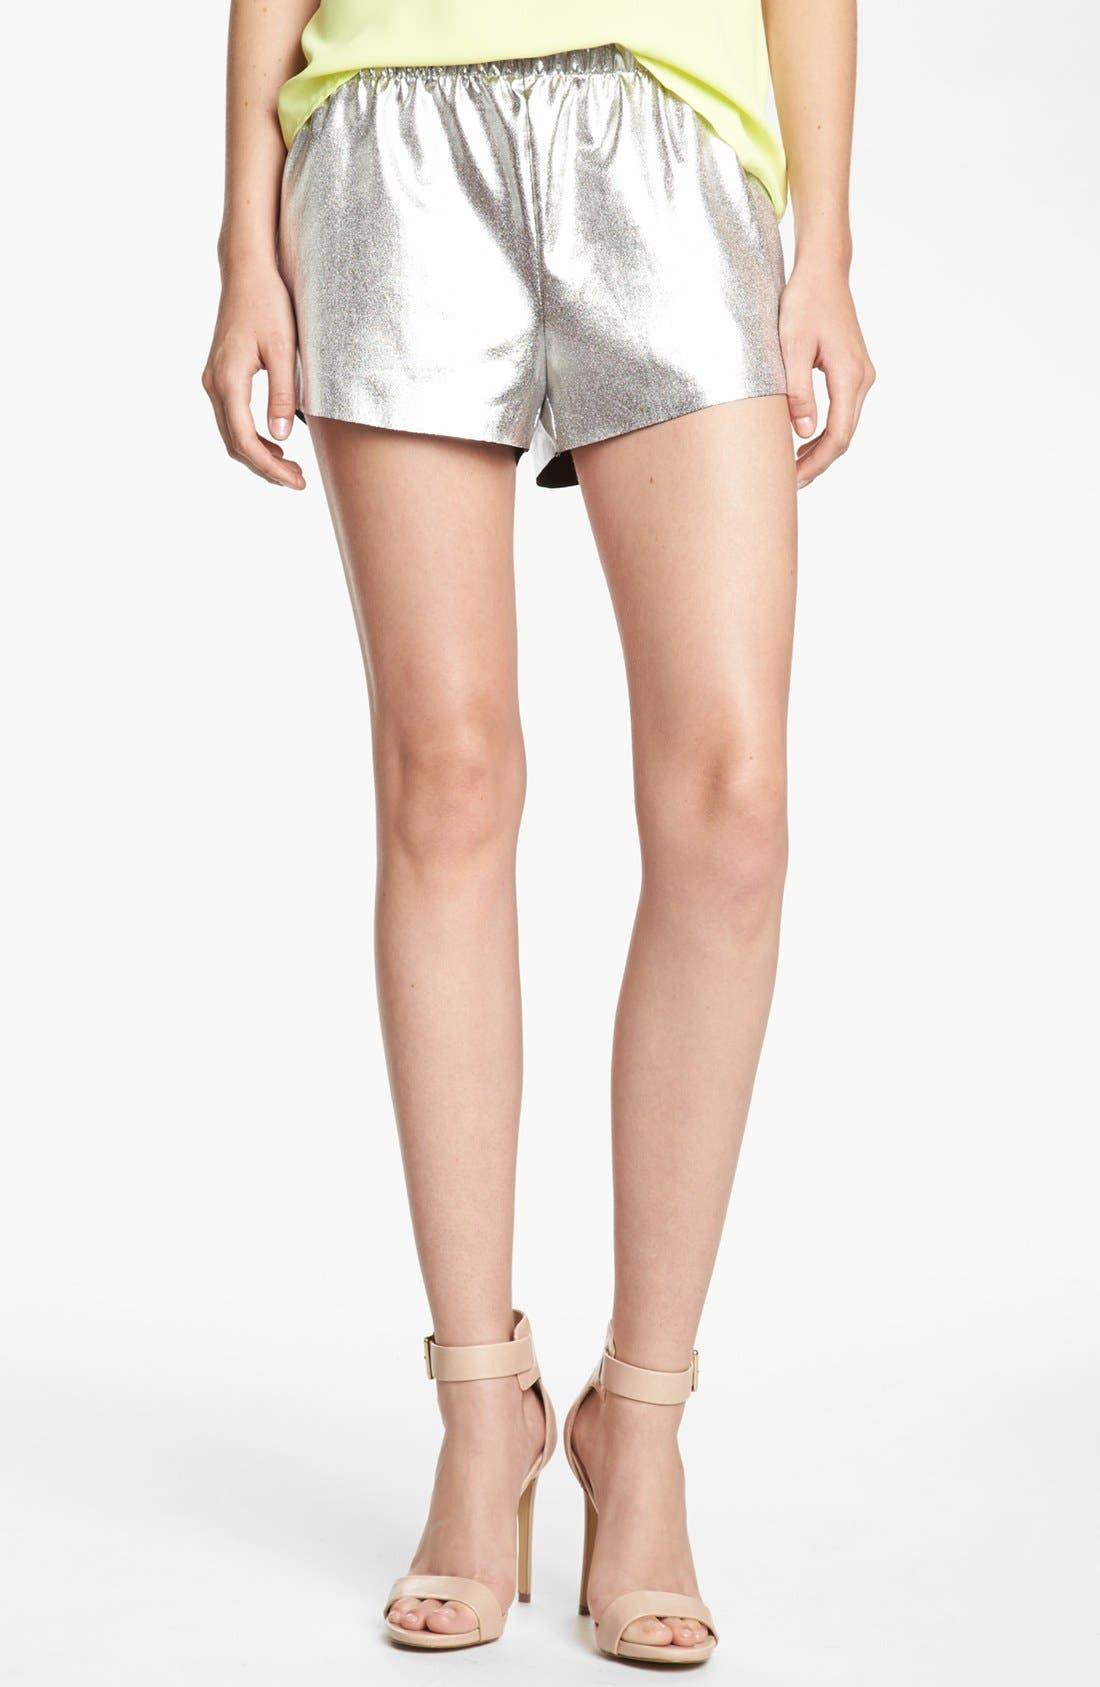 LEITH 'Cosmic' Metallic Tap Shorts, Main, color, 040